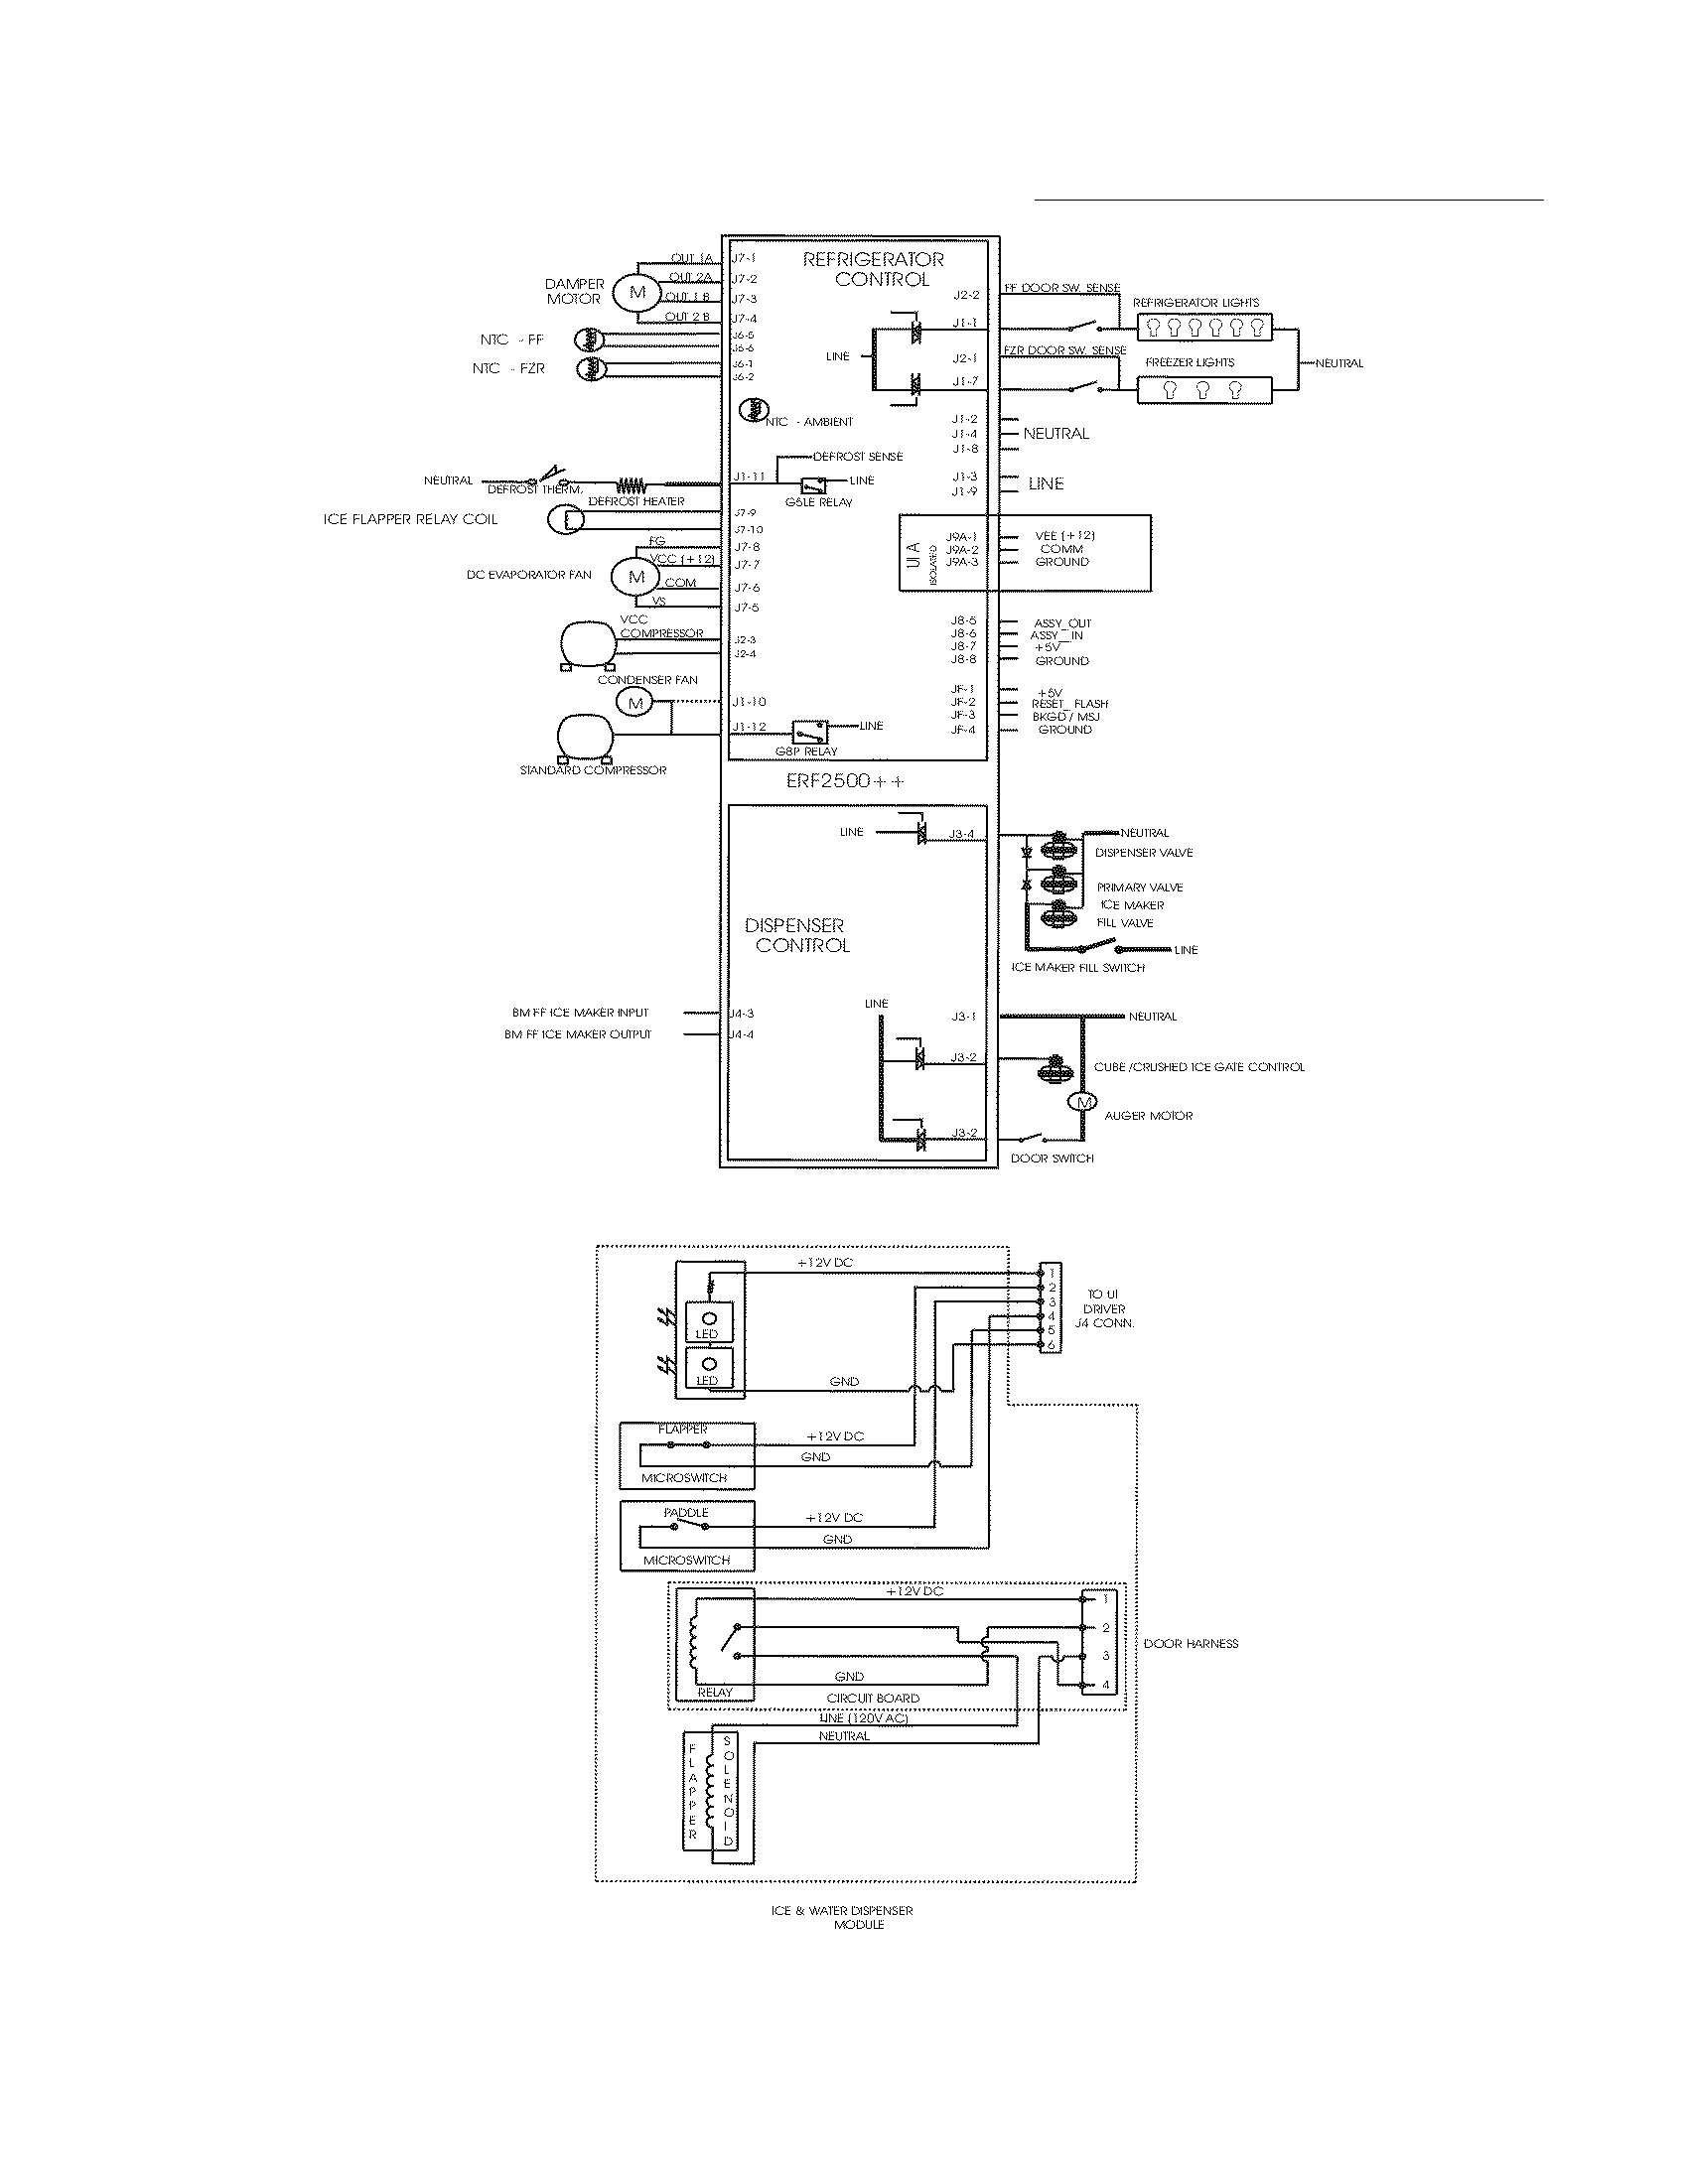 electrolux side by side refrigerator manual